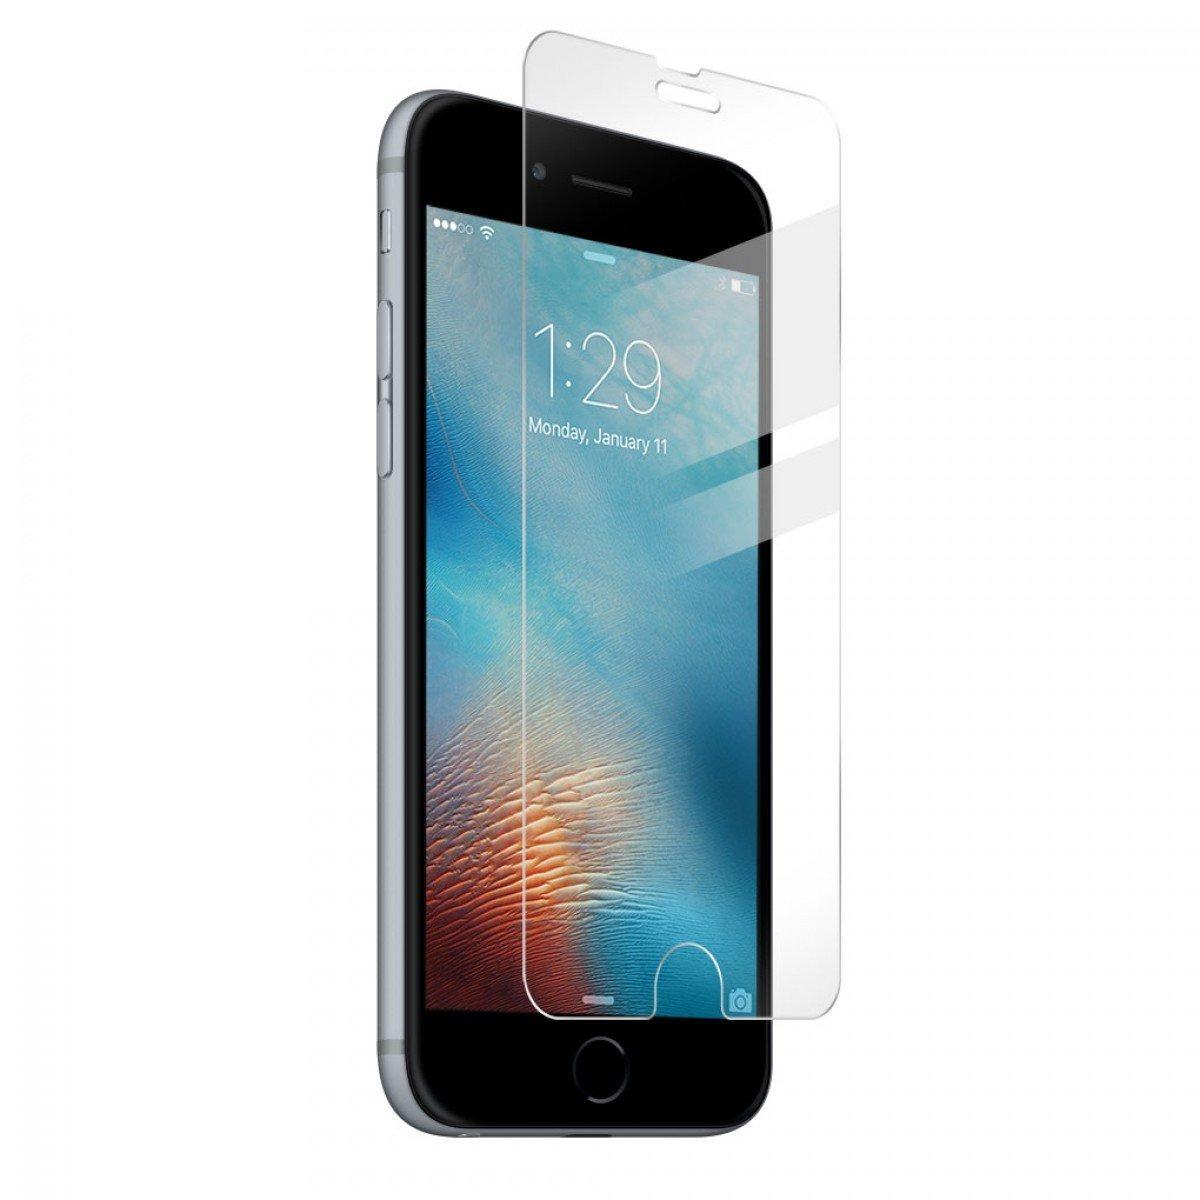 eed759c986e Vidrio iPhone 6 Plus Templado Para Protector Gorilla Glass - $ 99,99 ...